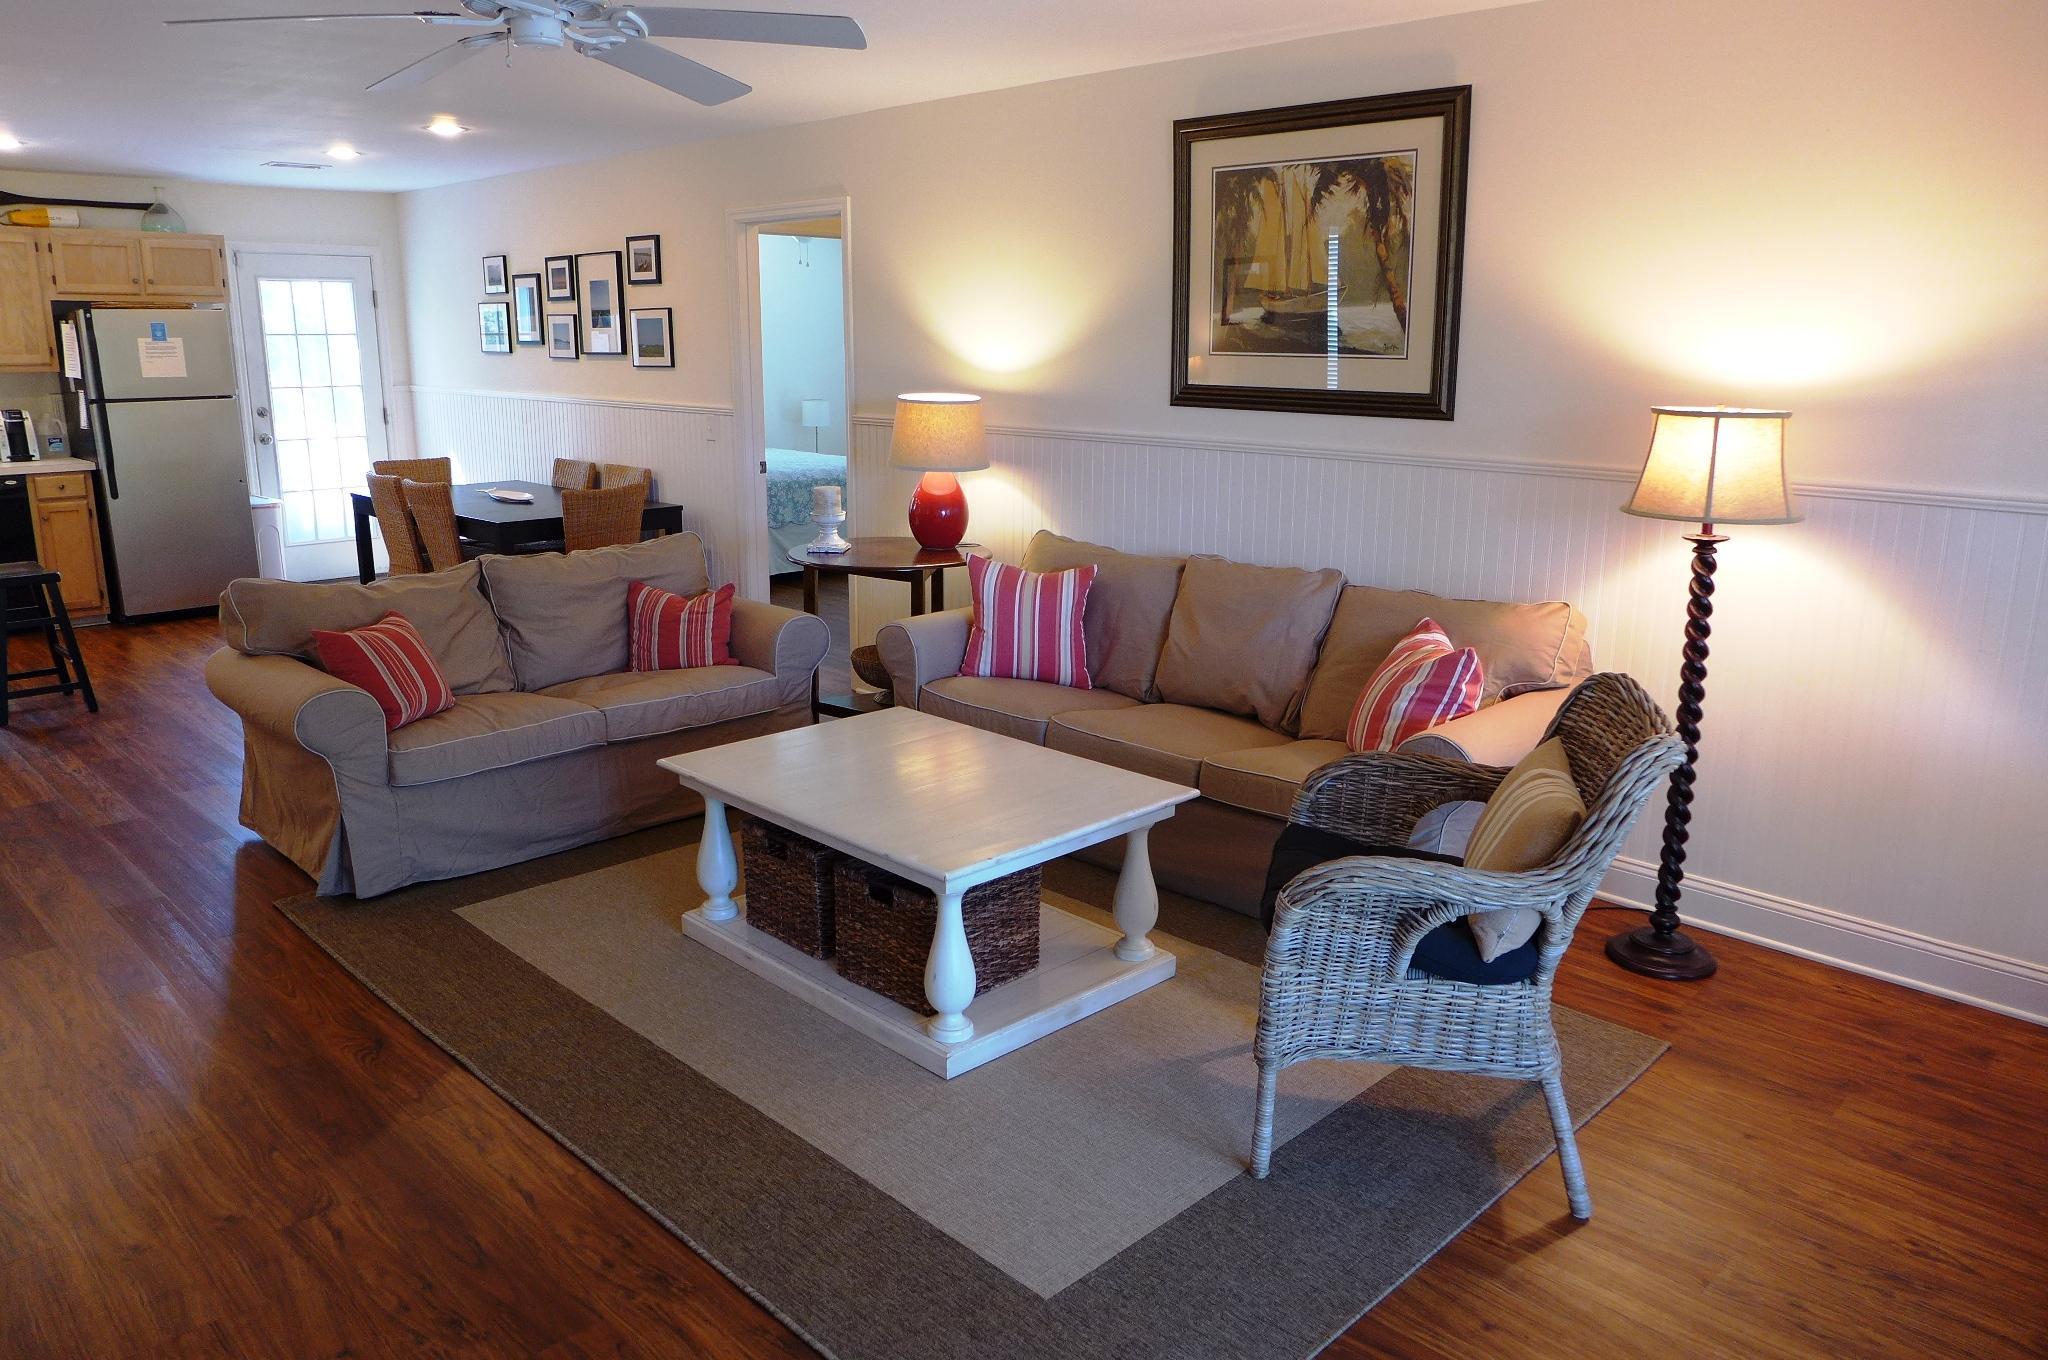 Edisto Beach Homes For Sale - 2202 Myrtle, Edisto Beach, SC - 19